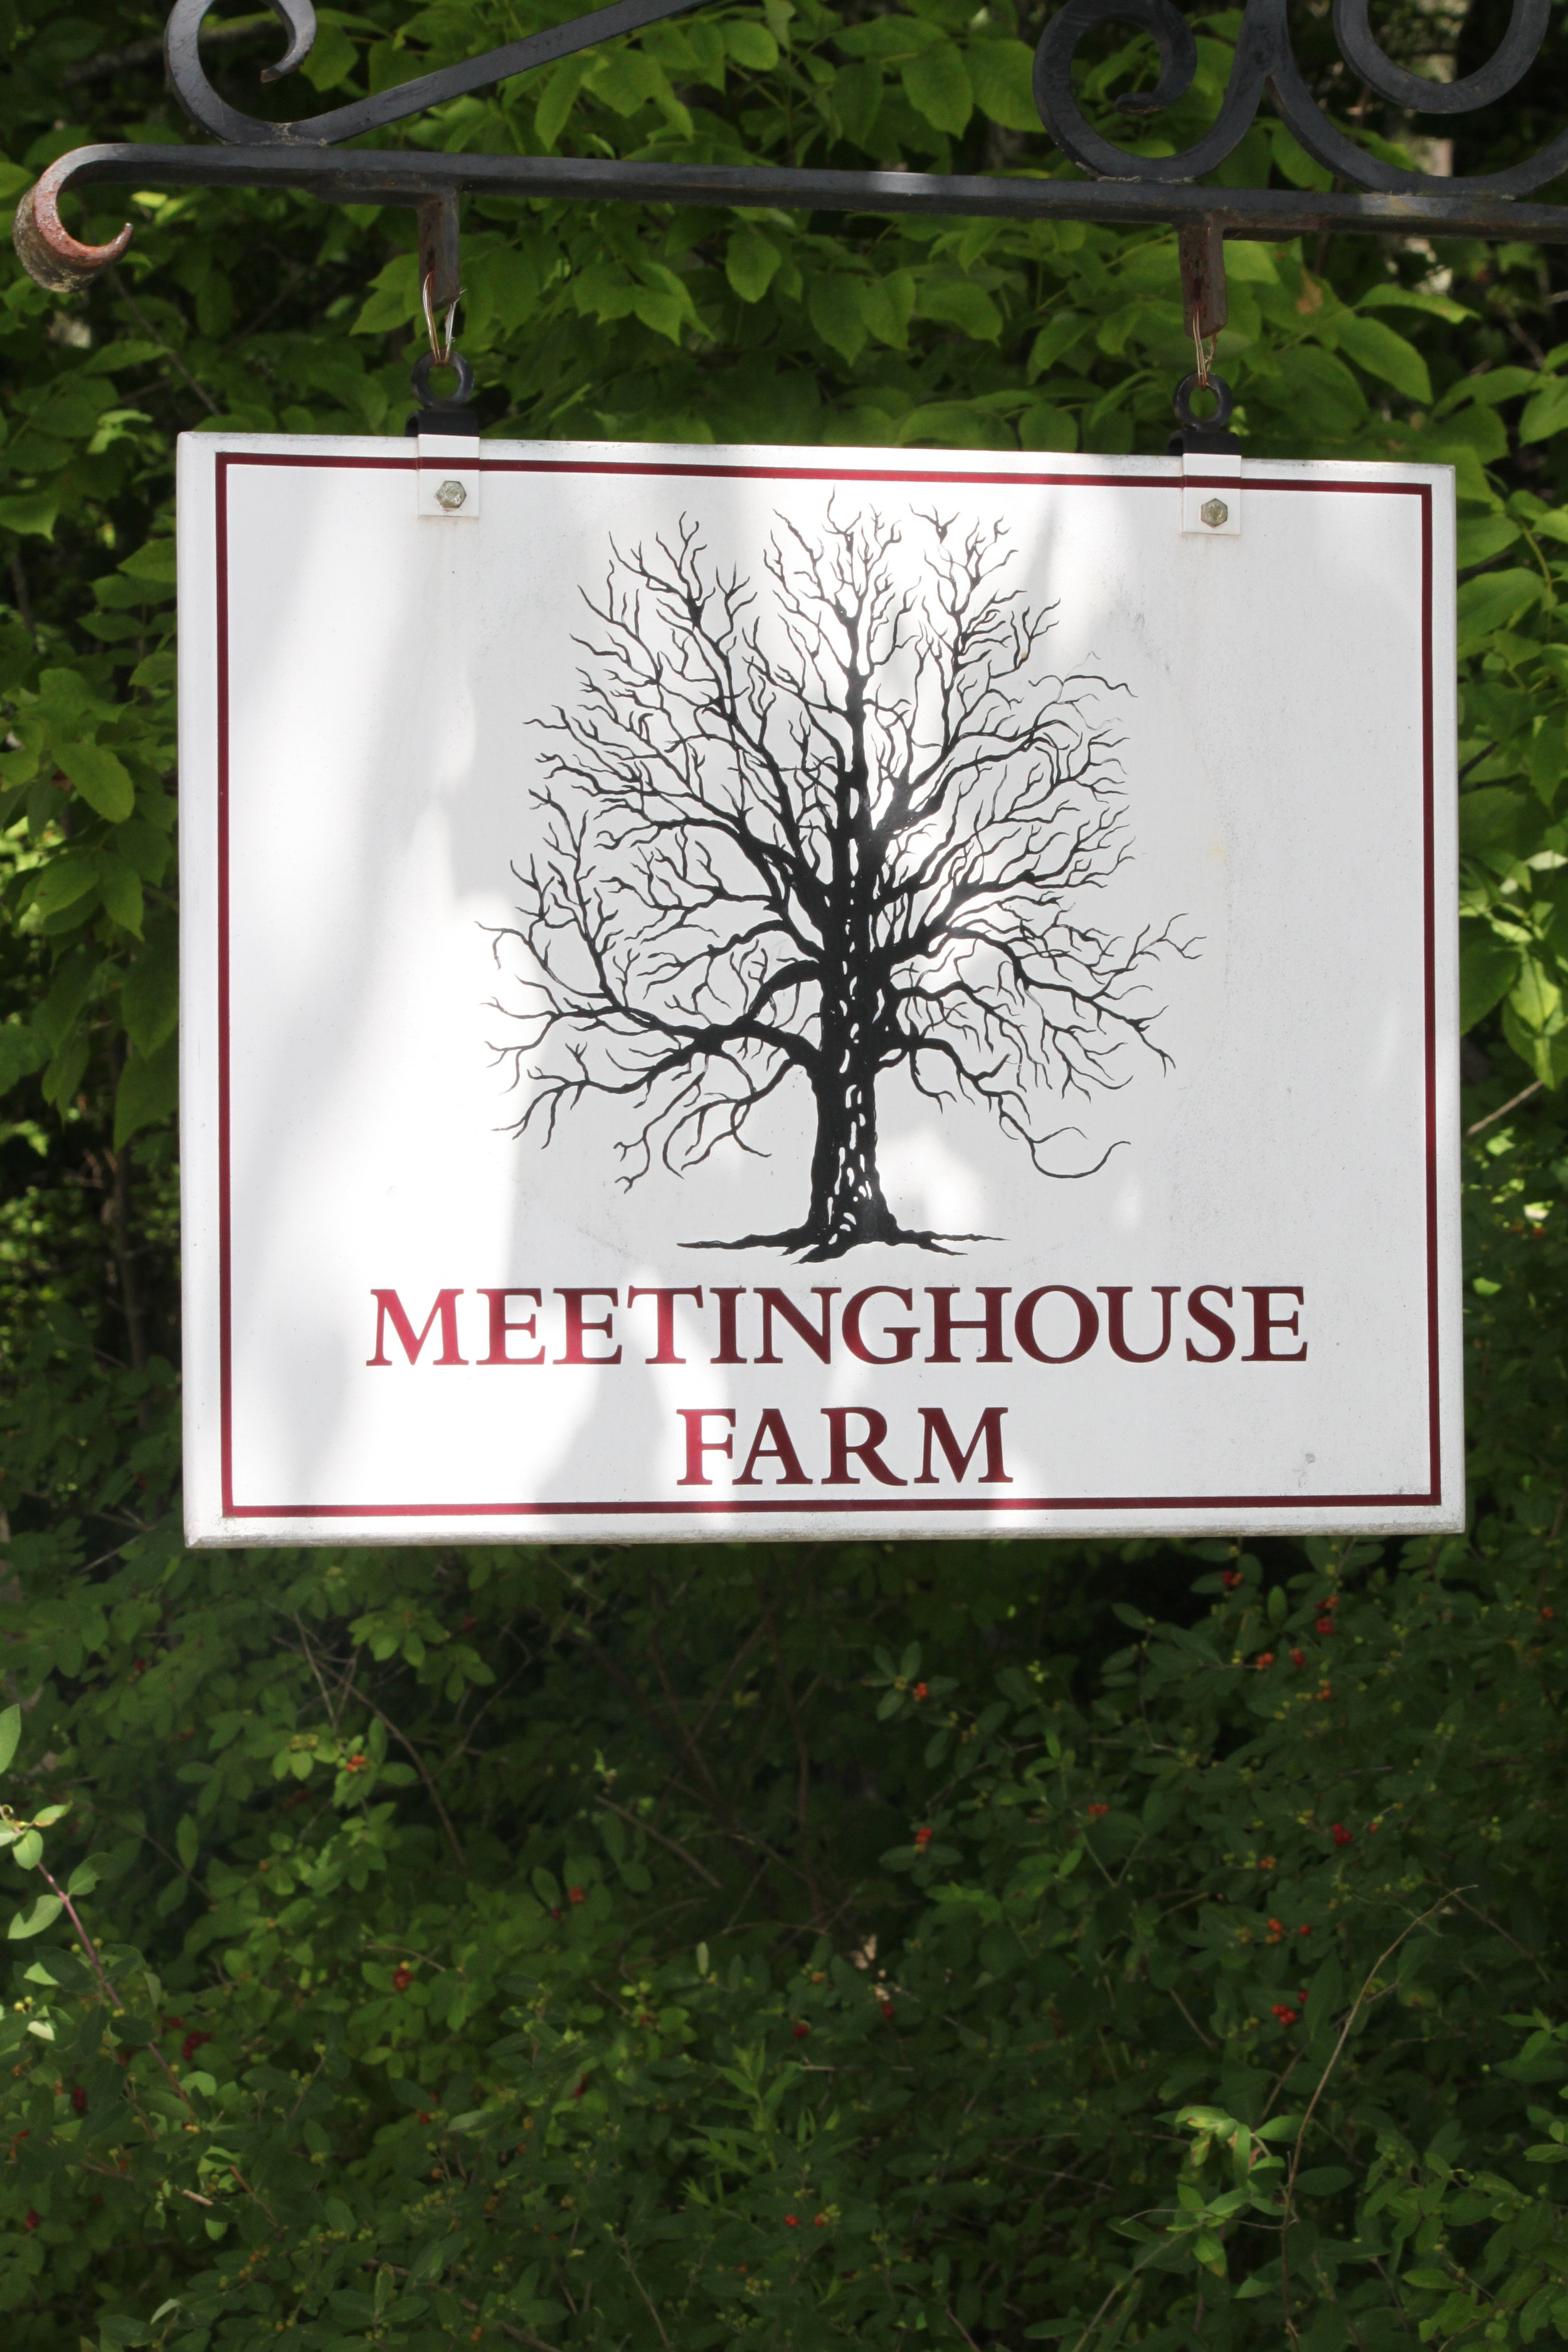 Meetinghouse Farm (Penny Asherman) 2.jpg